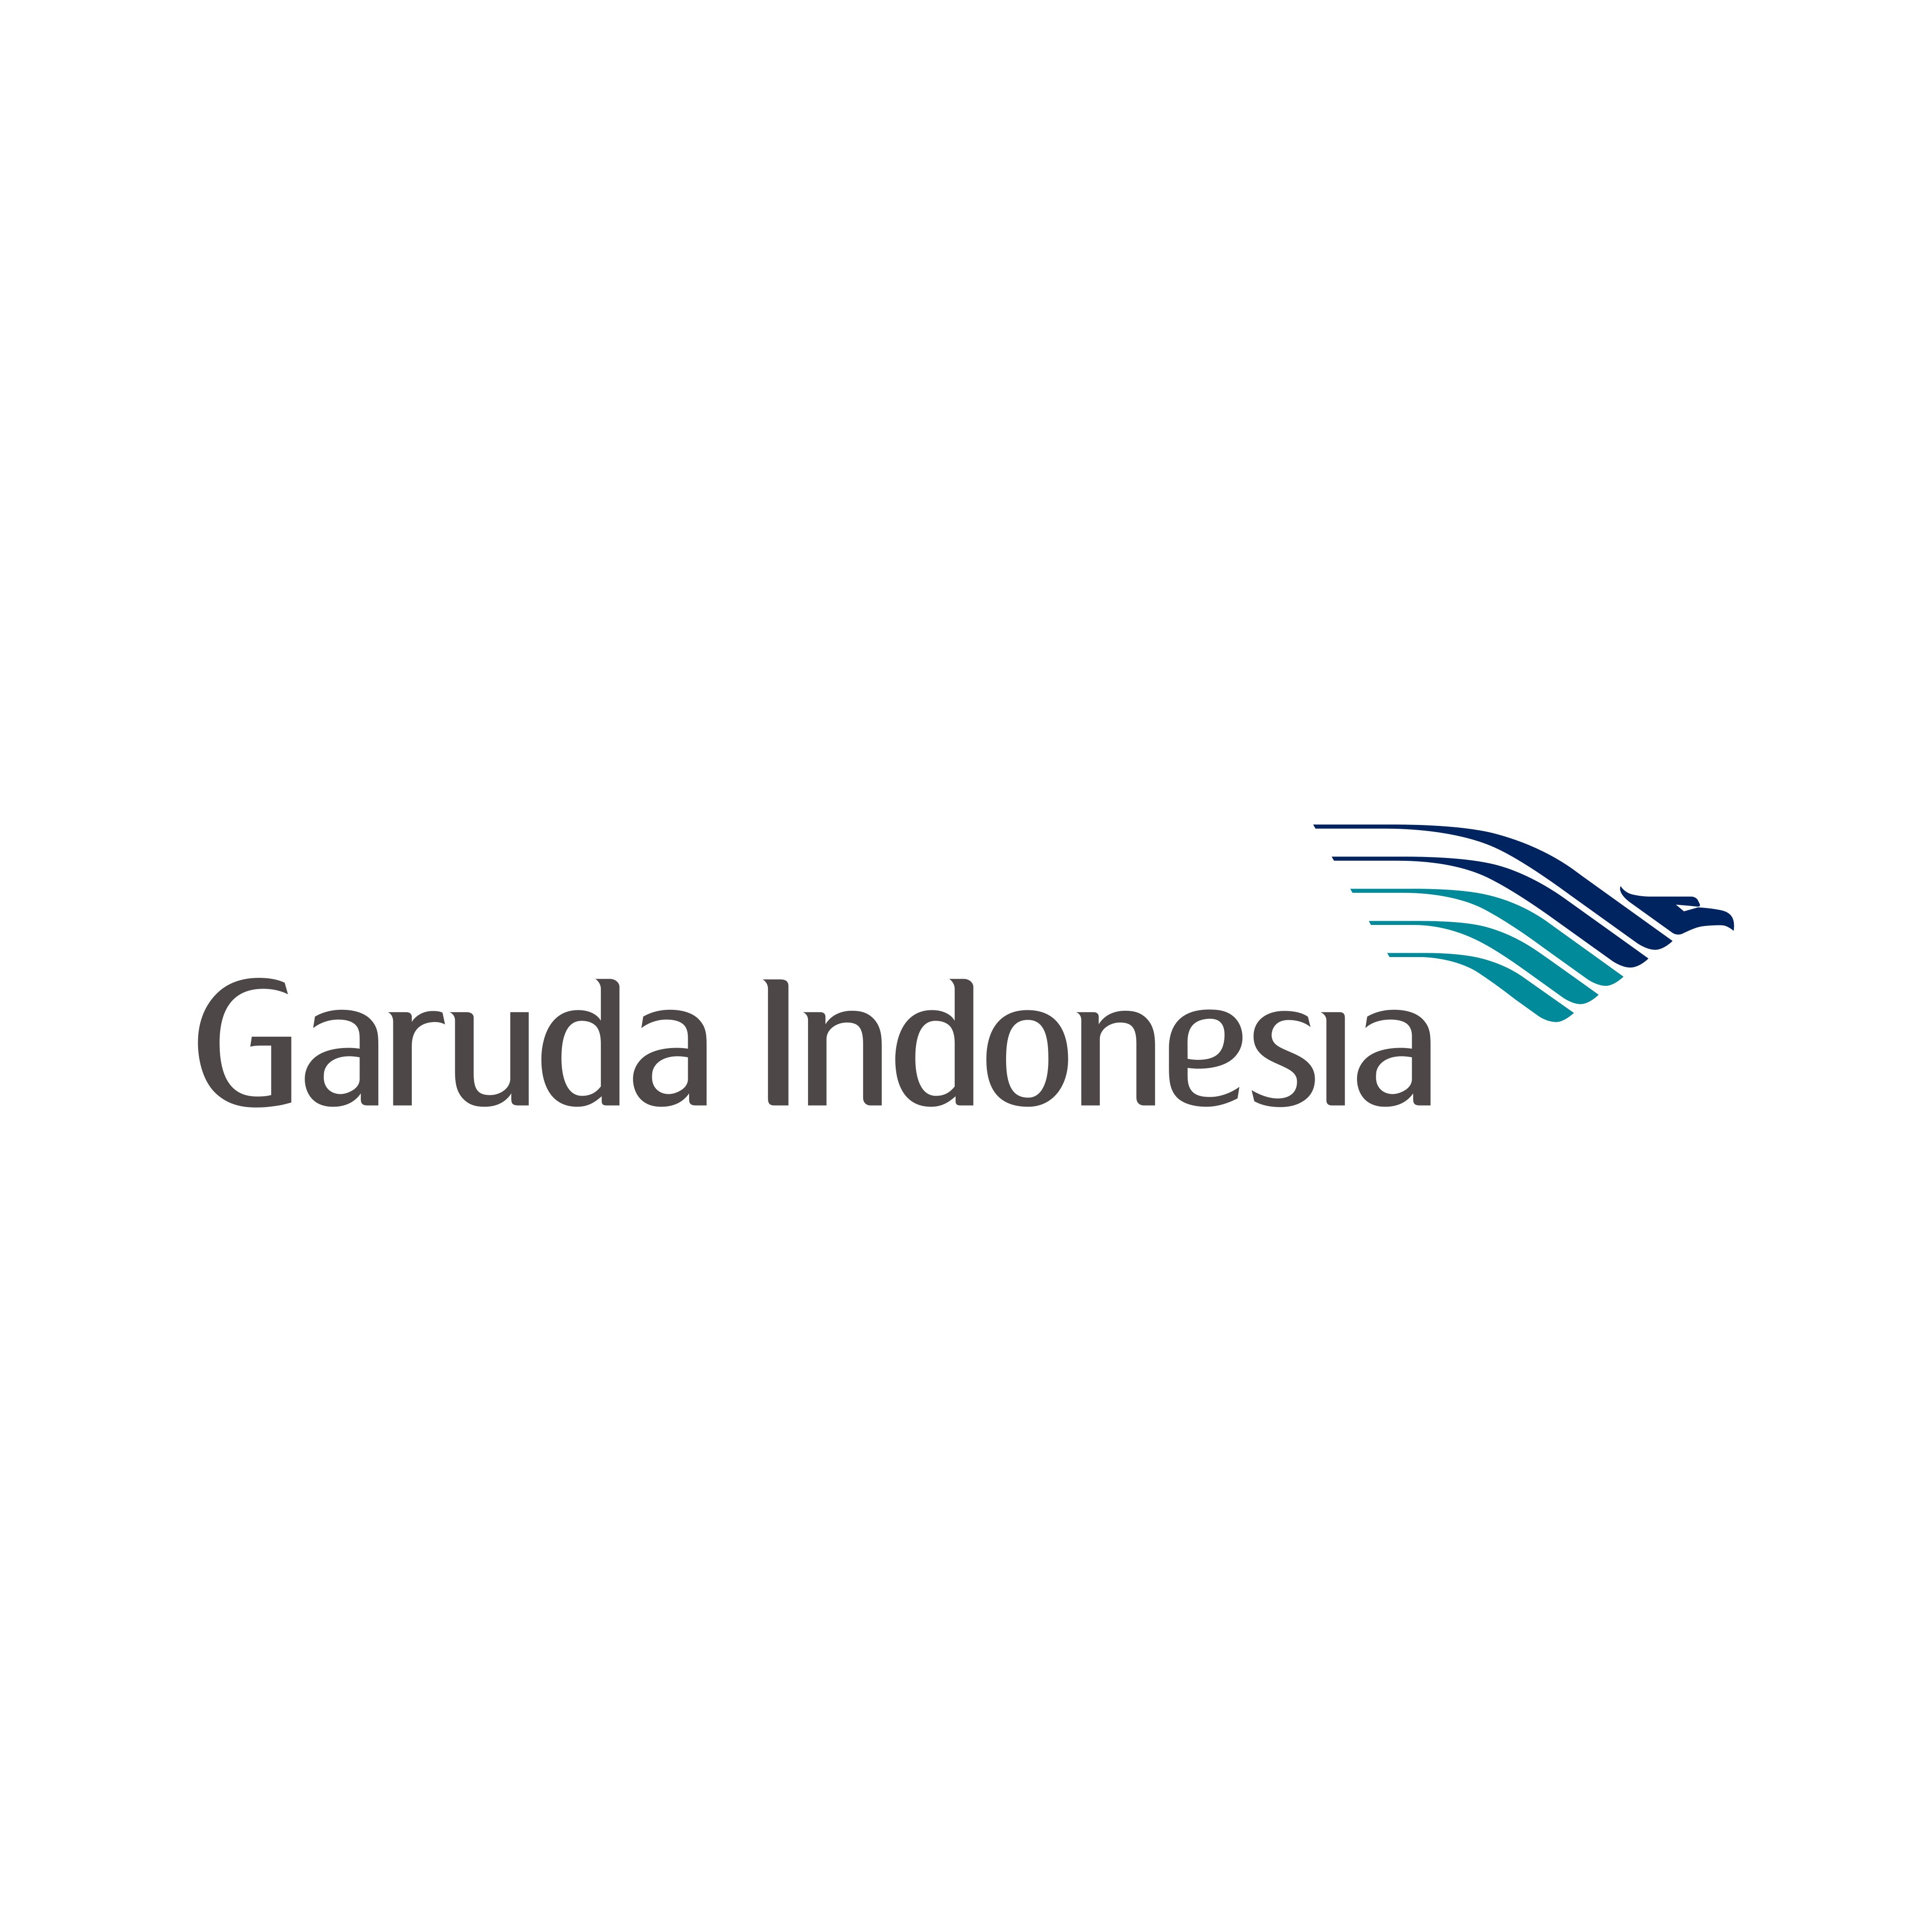 garuda indonesia logo 0 - Garuda Indonésia Airlines Logo